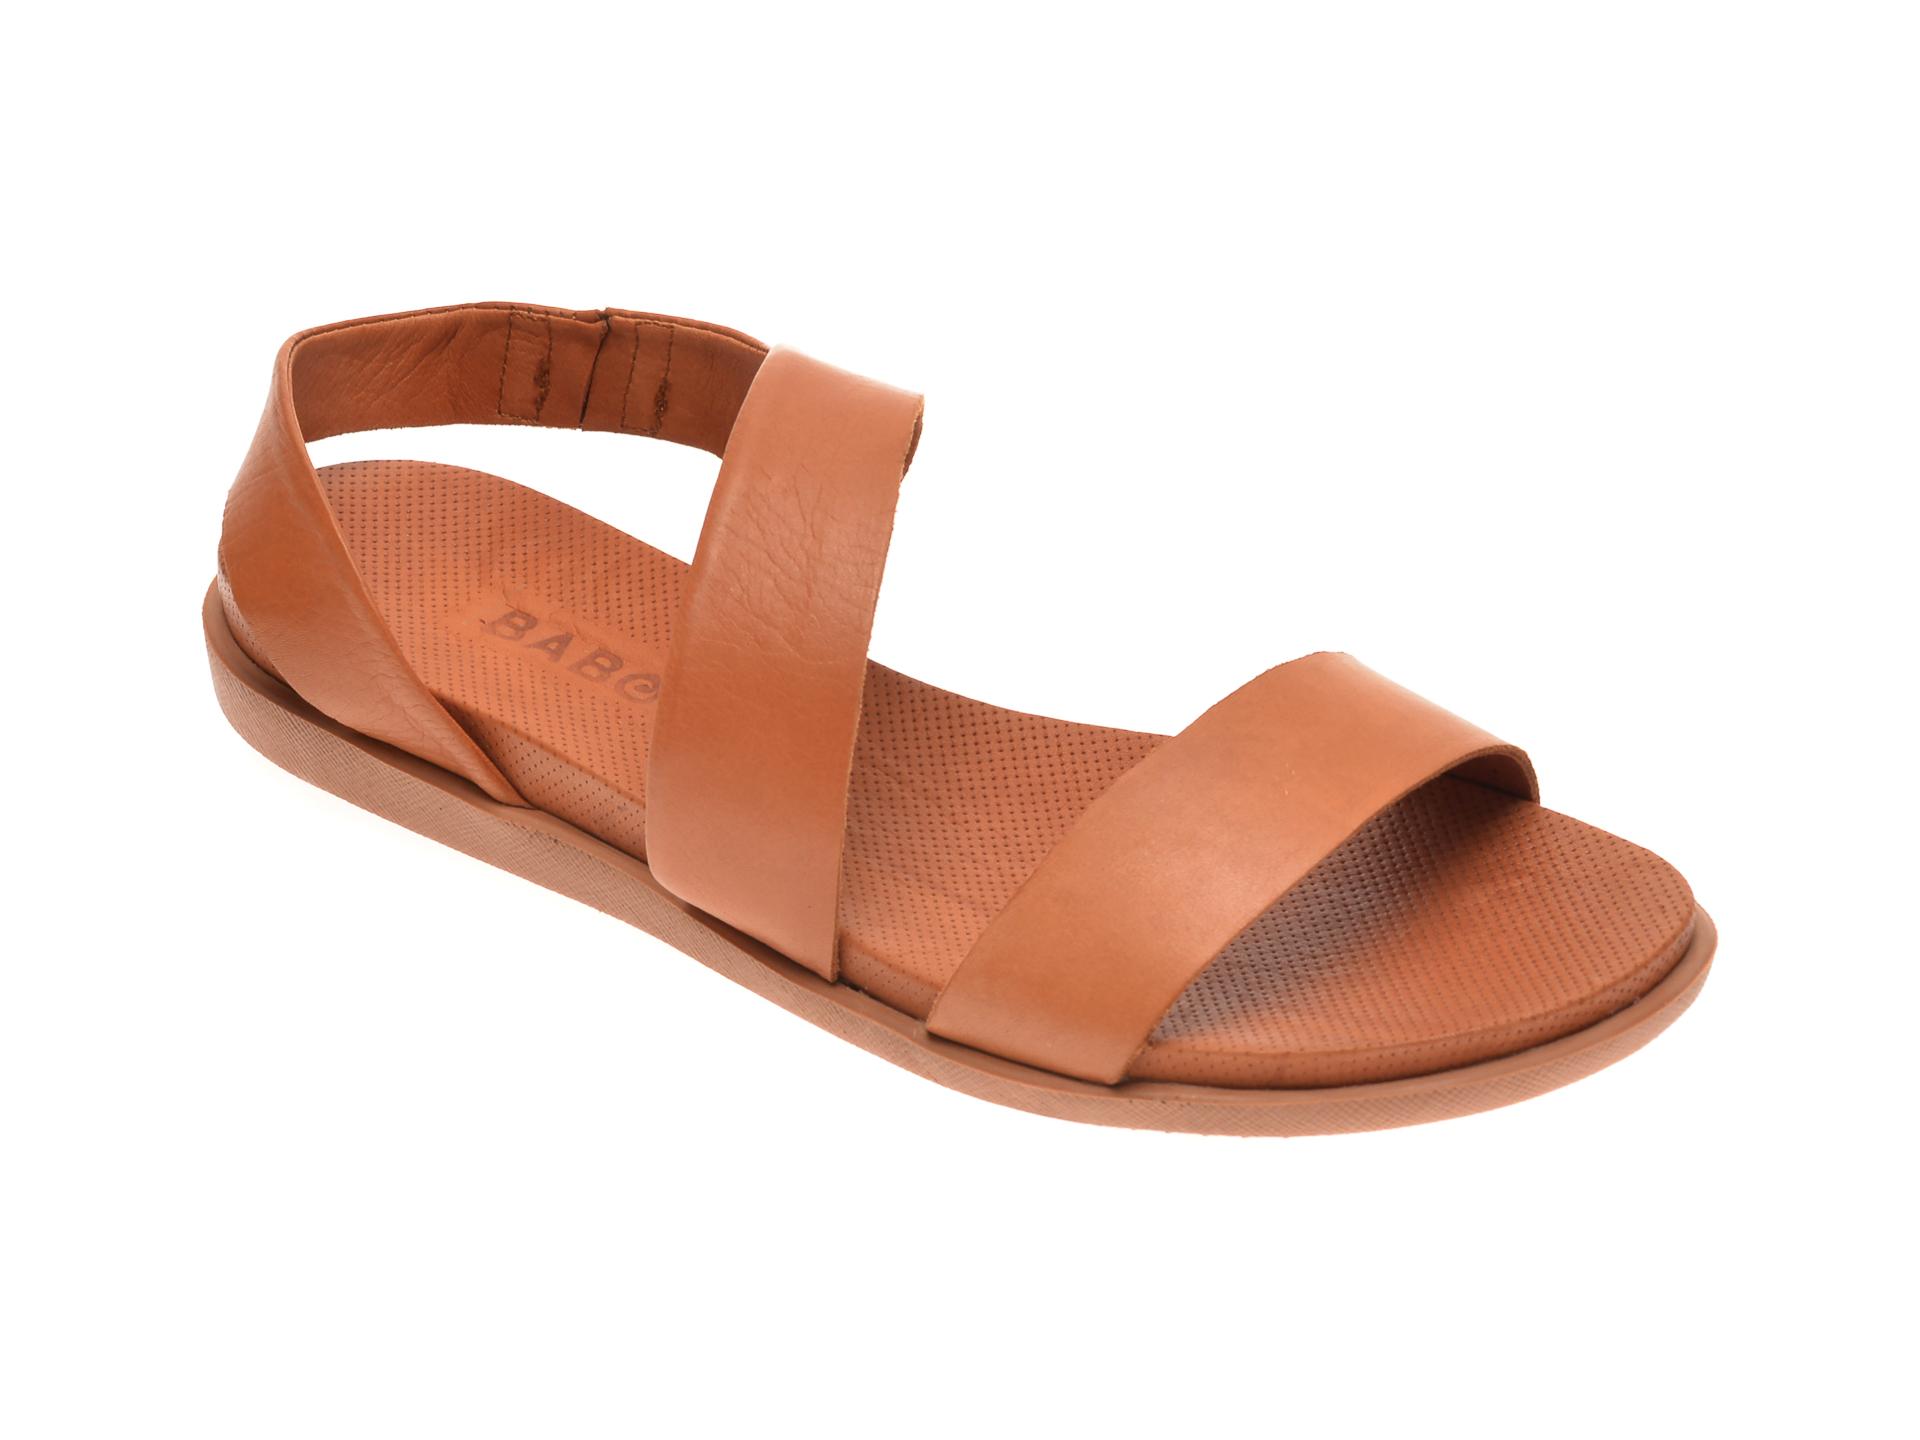 Sandale BABOOS maro, 1402, din piele naturala